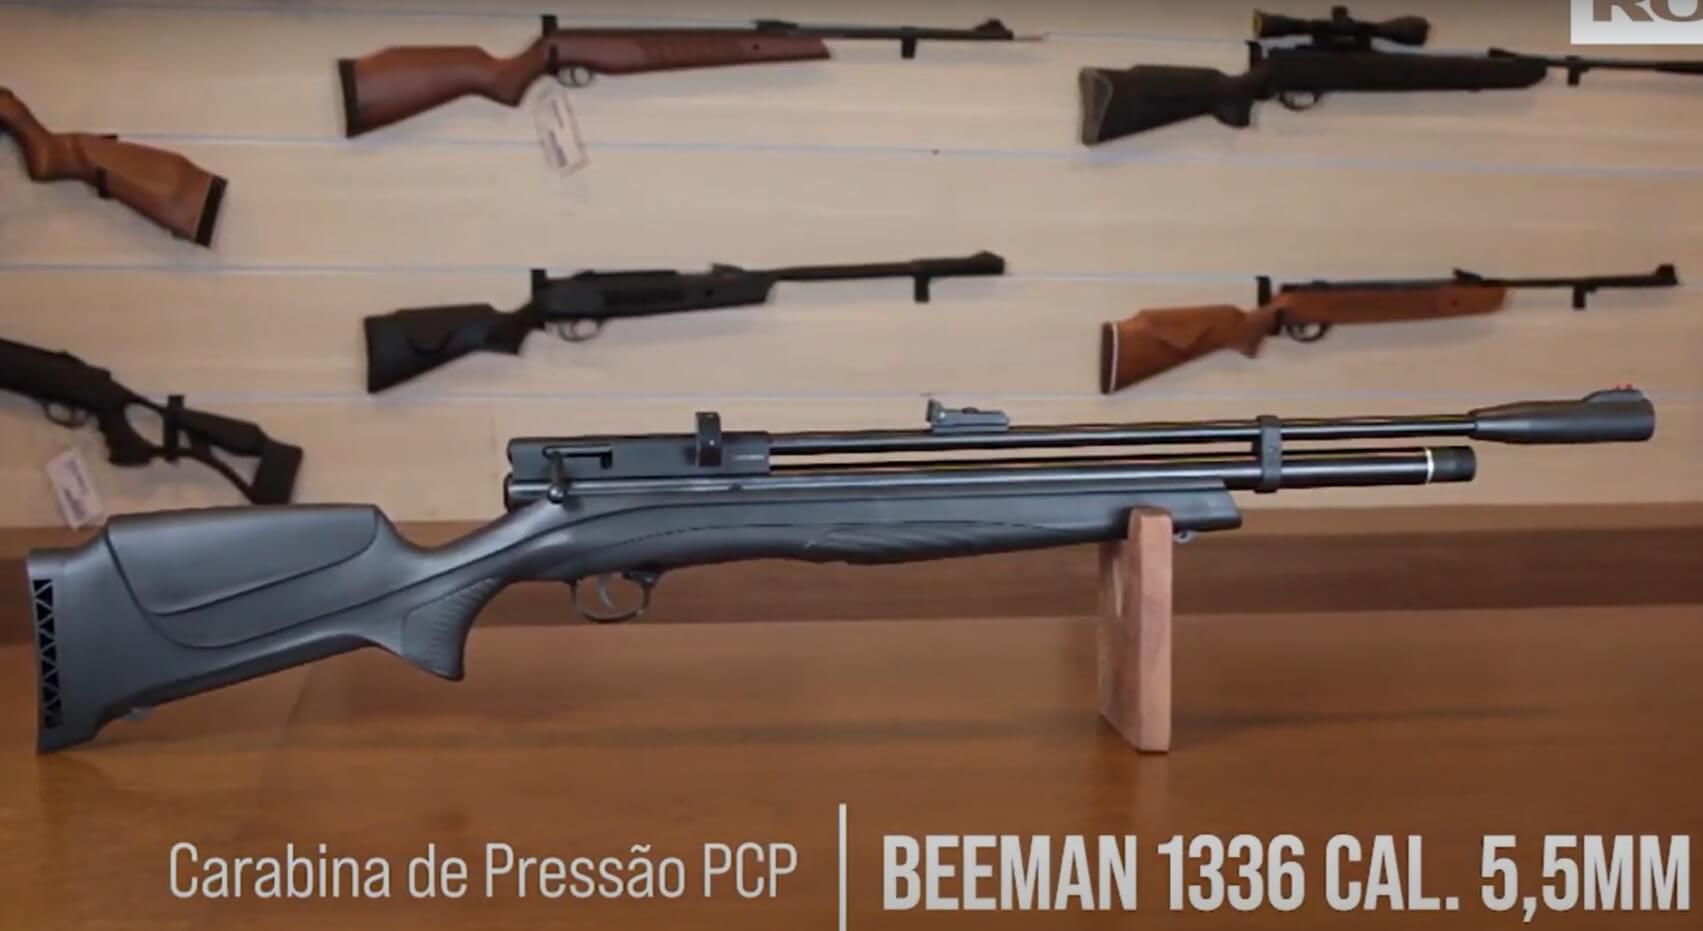 Carabina PCP Beeman 1336 POLIMERI 10 tiros 5,5mm 1+ Bomba ROSSI